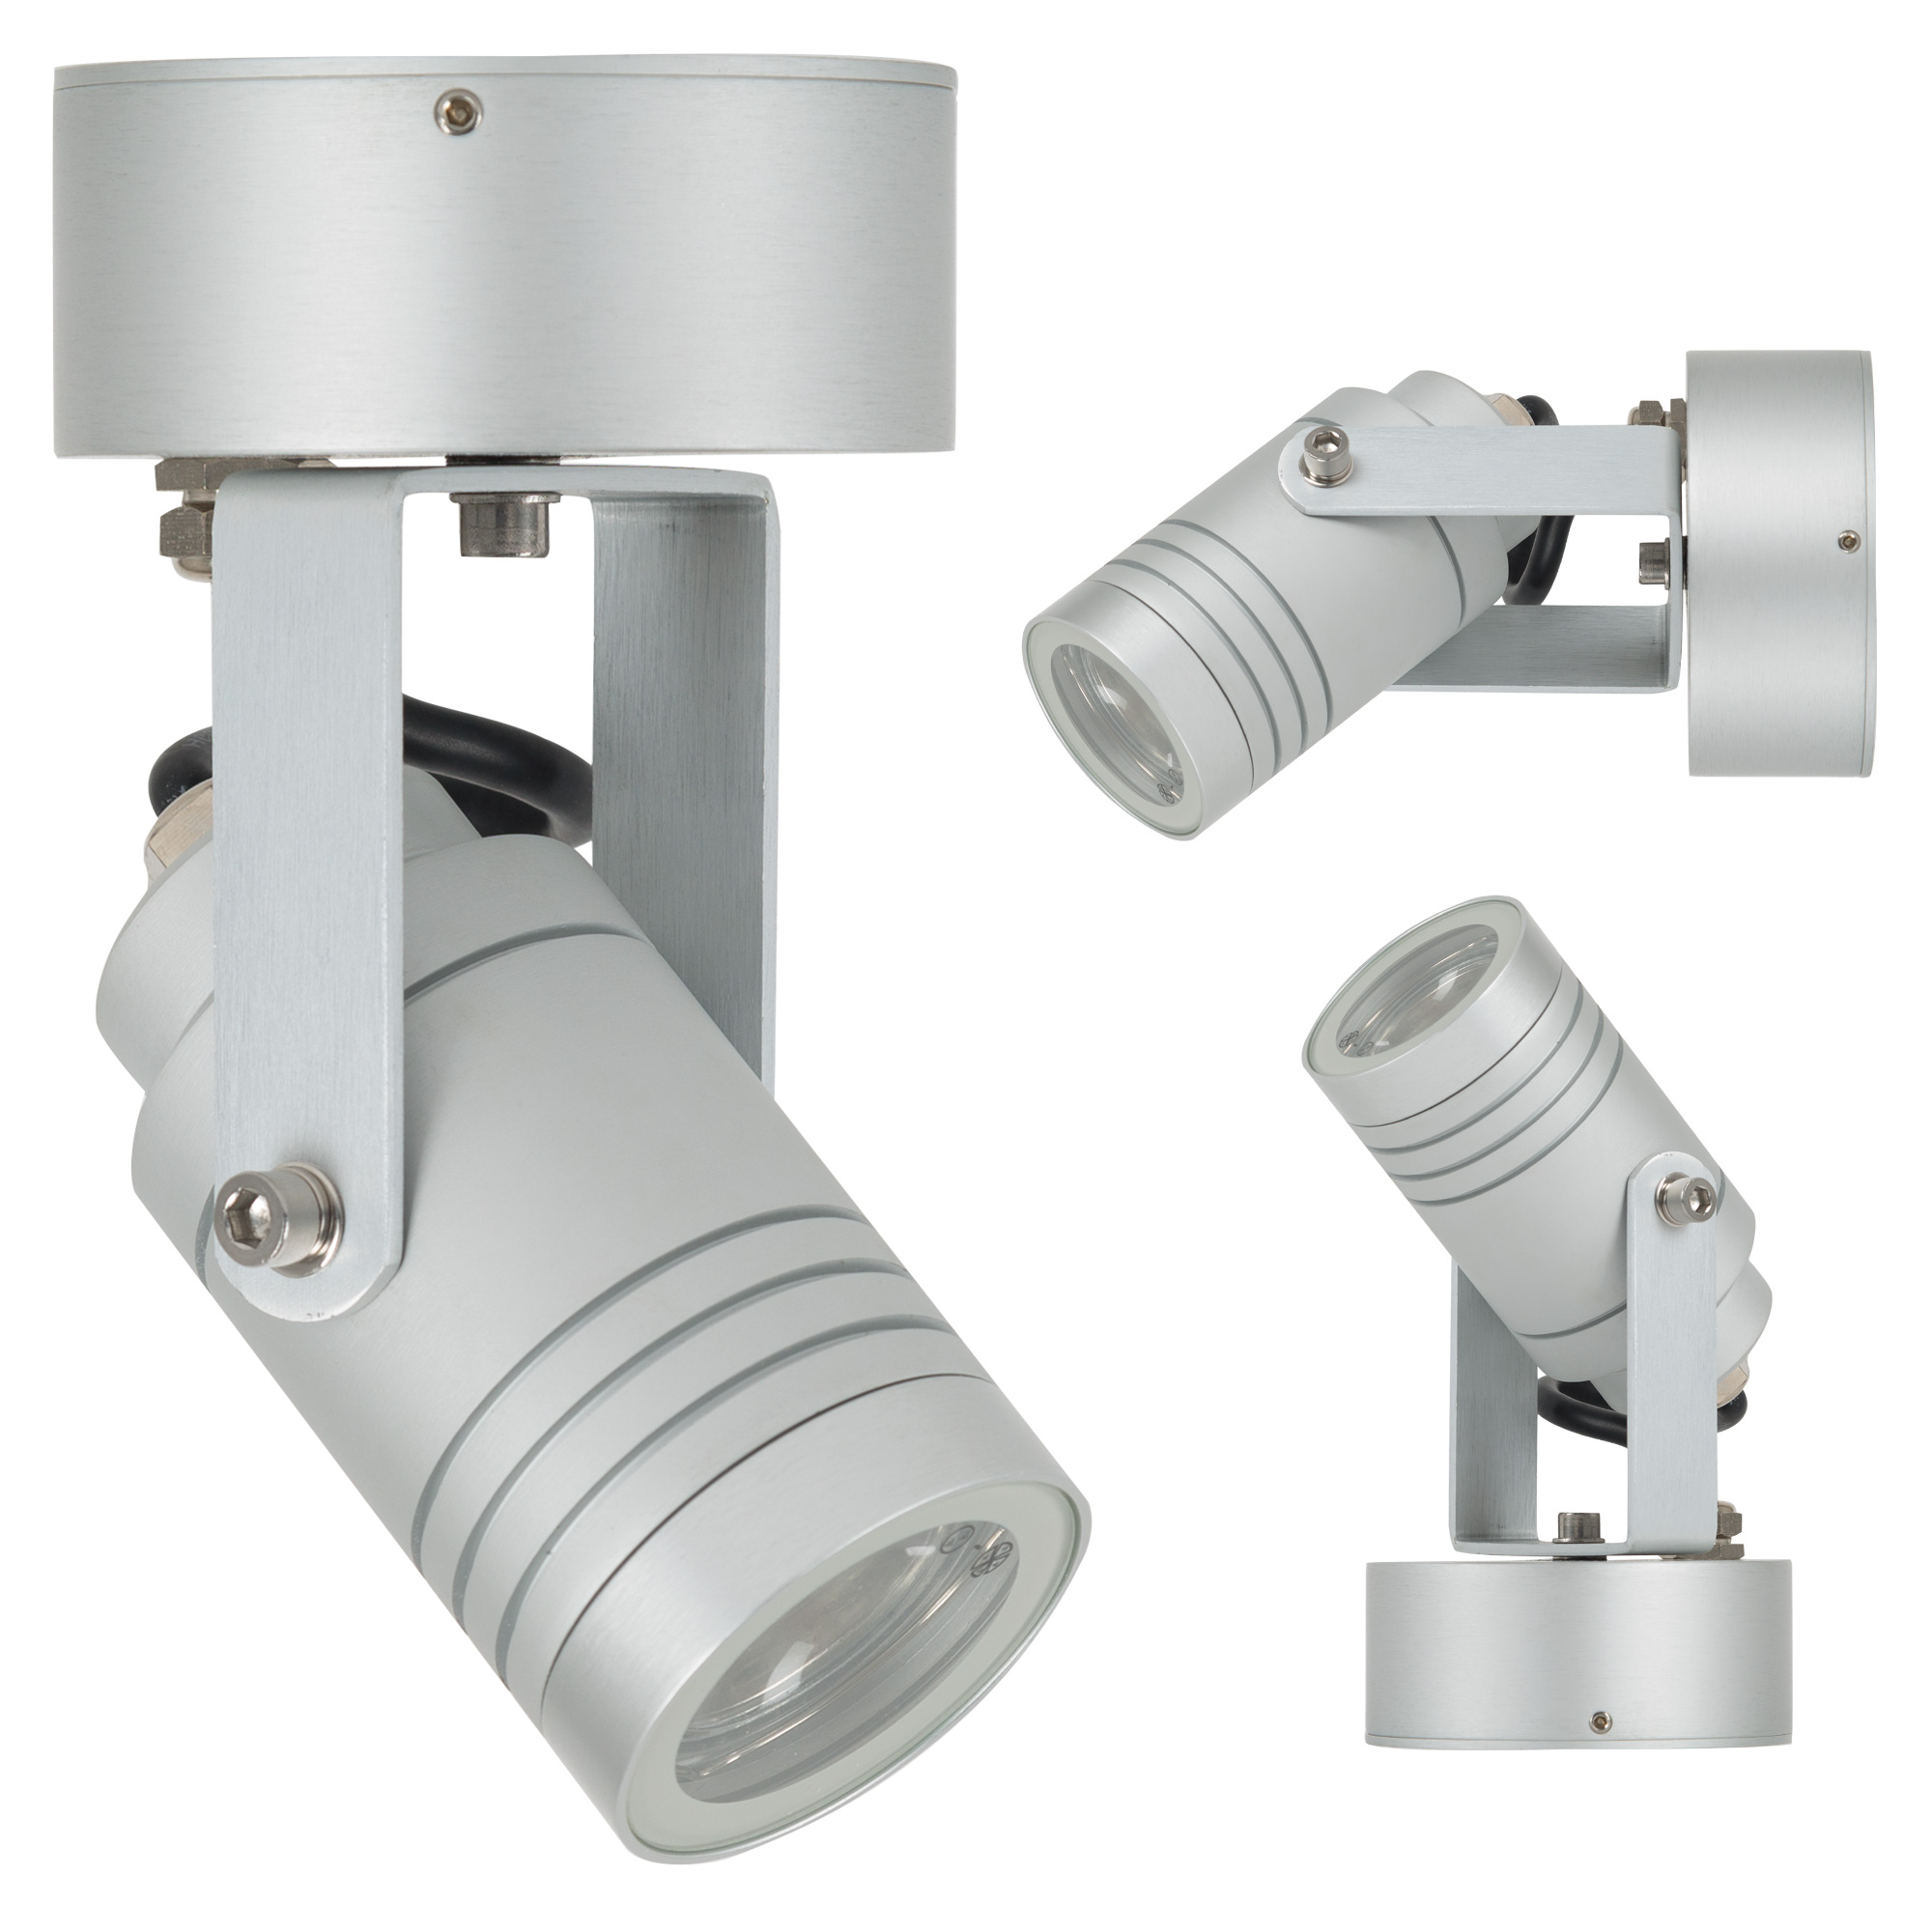 Beamer incl. 5W LED